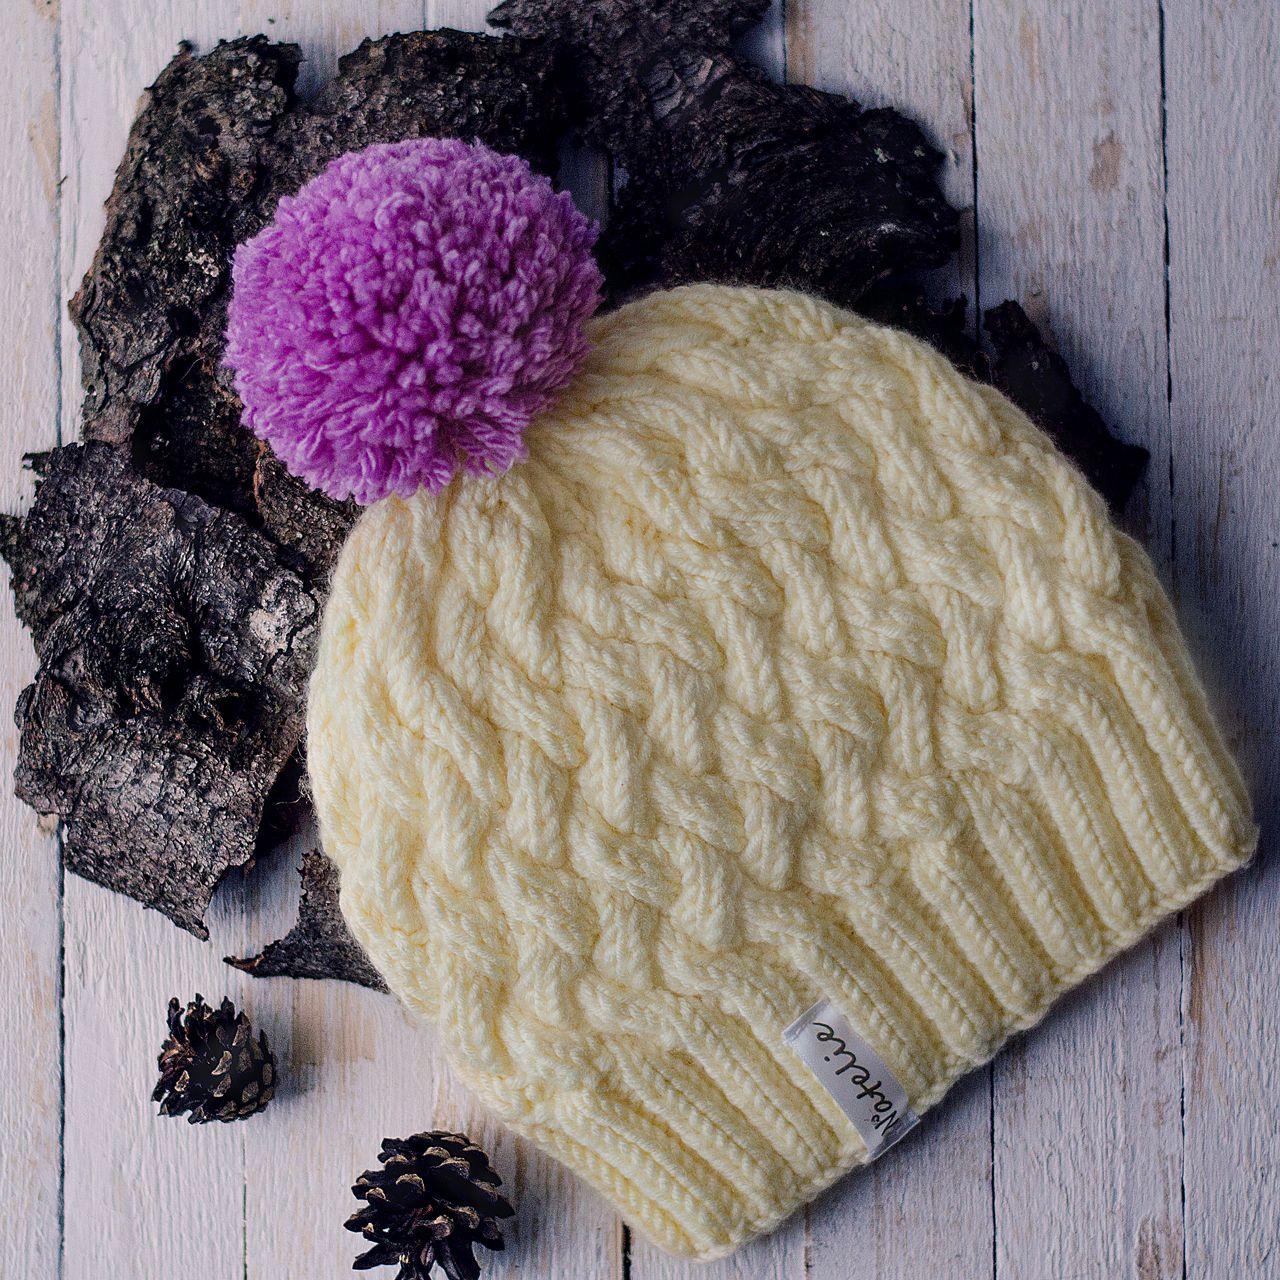 ручнаяработа вязанаяшапка вязание шапкаспомпоном шапка продажа одежда аксессуар спицами